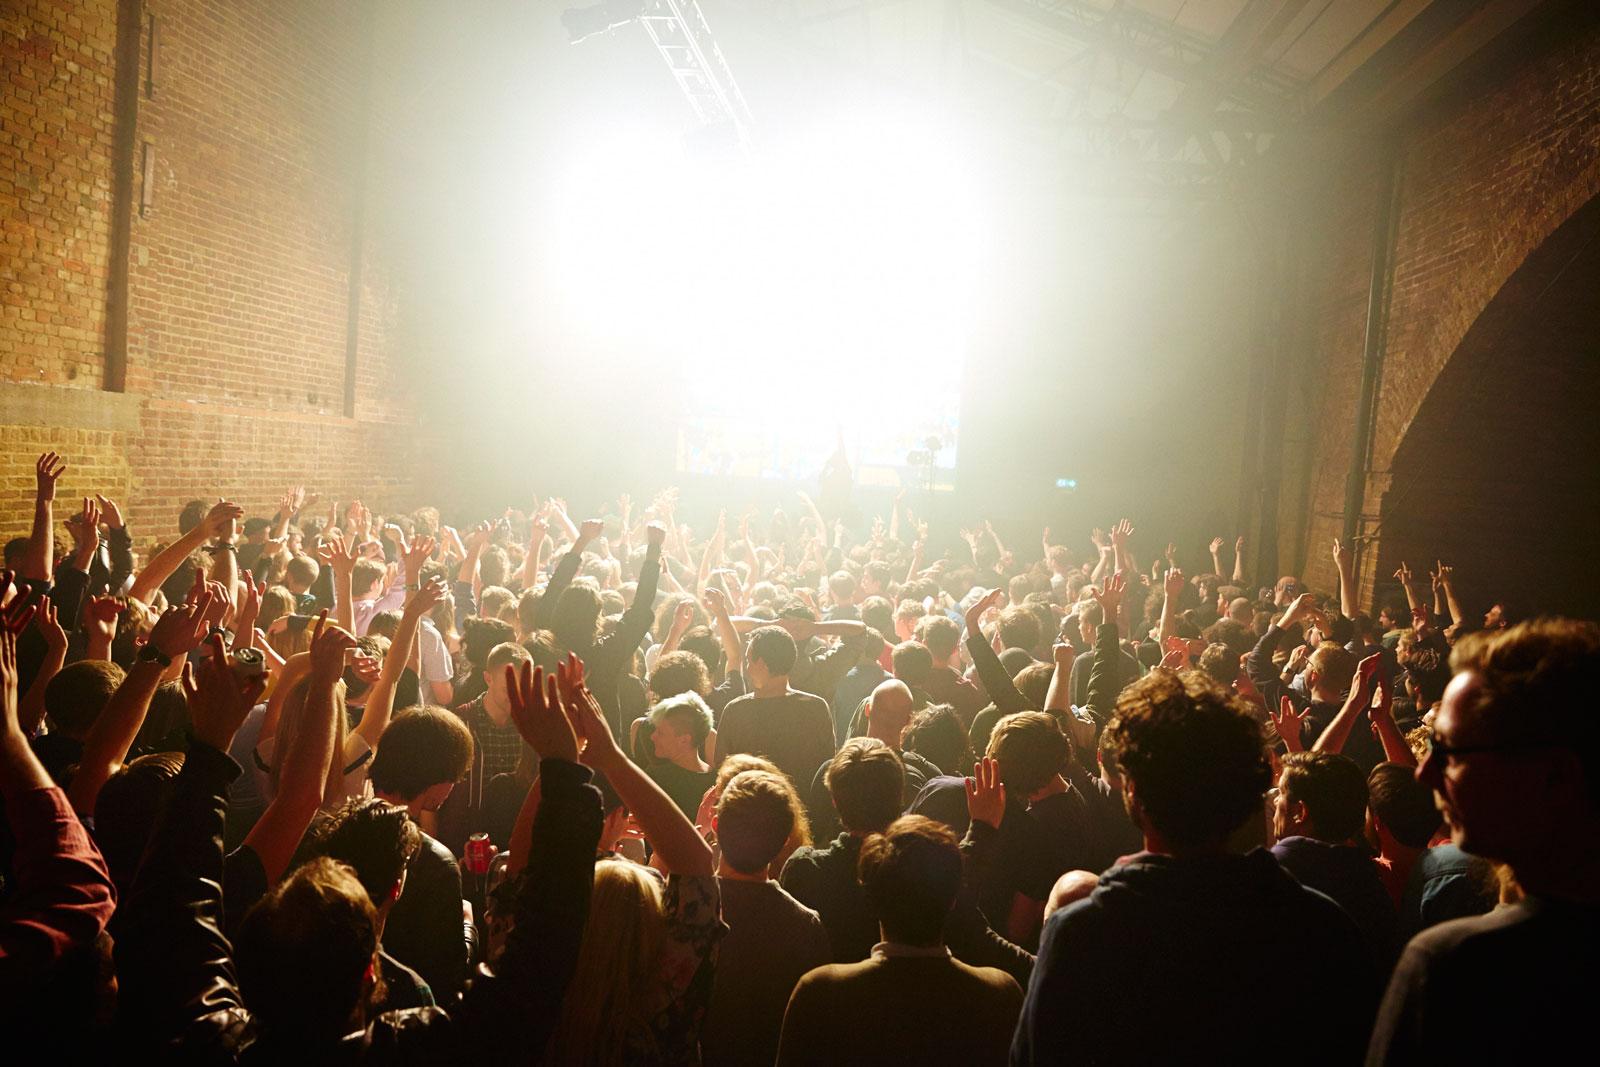 Crowd-shot-at-Dan-Deacon-by-Manuel-Vason-1600px